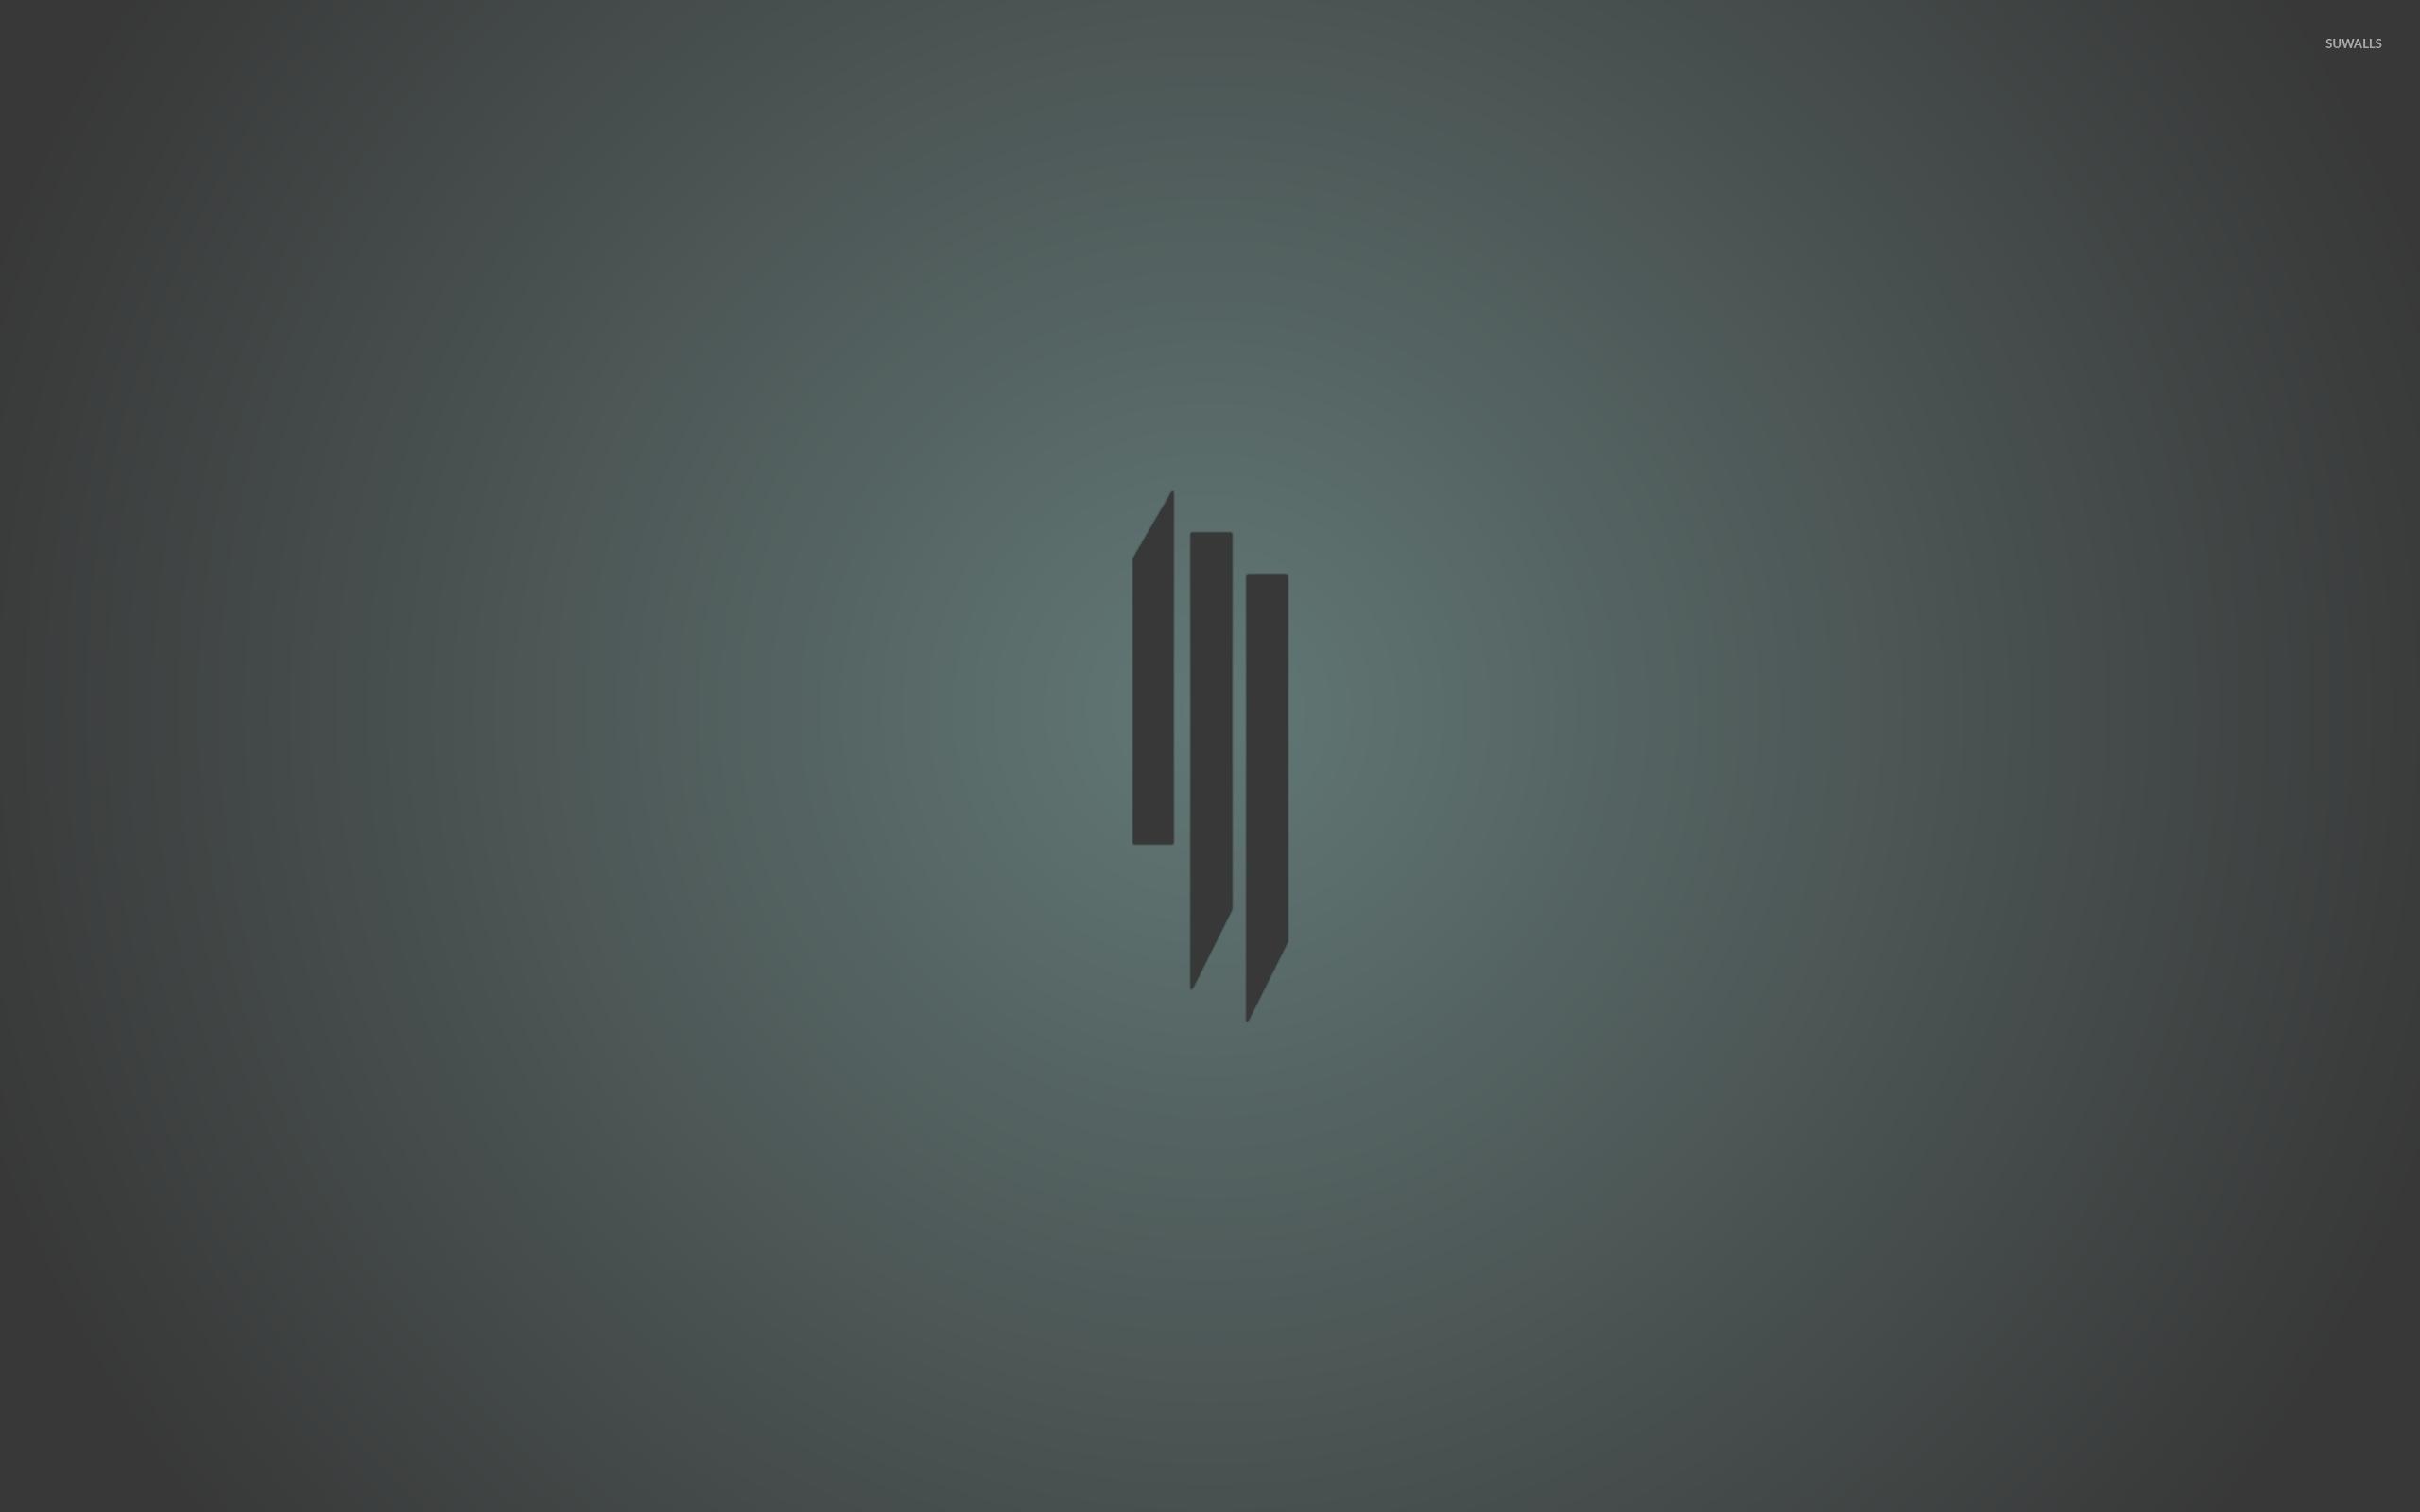 Fantastic Wallpaper Logo Skrillex - skrillex-27959-2560x1600  Image_621641.jpg